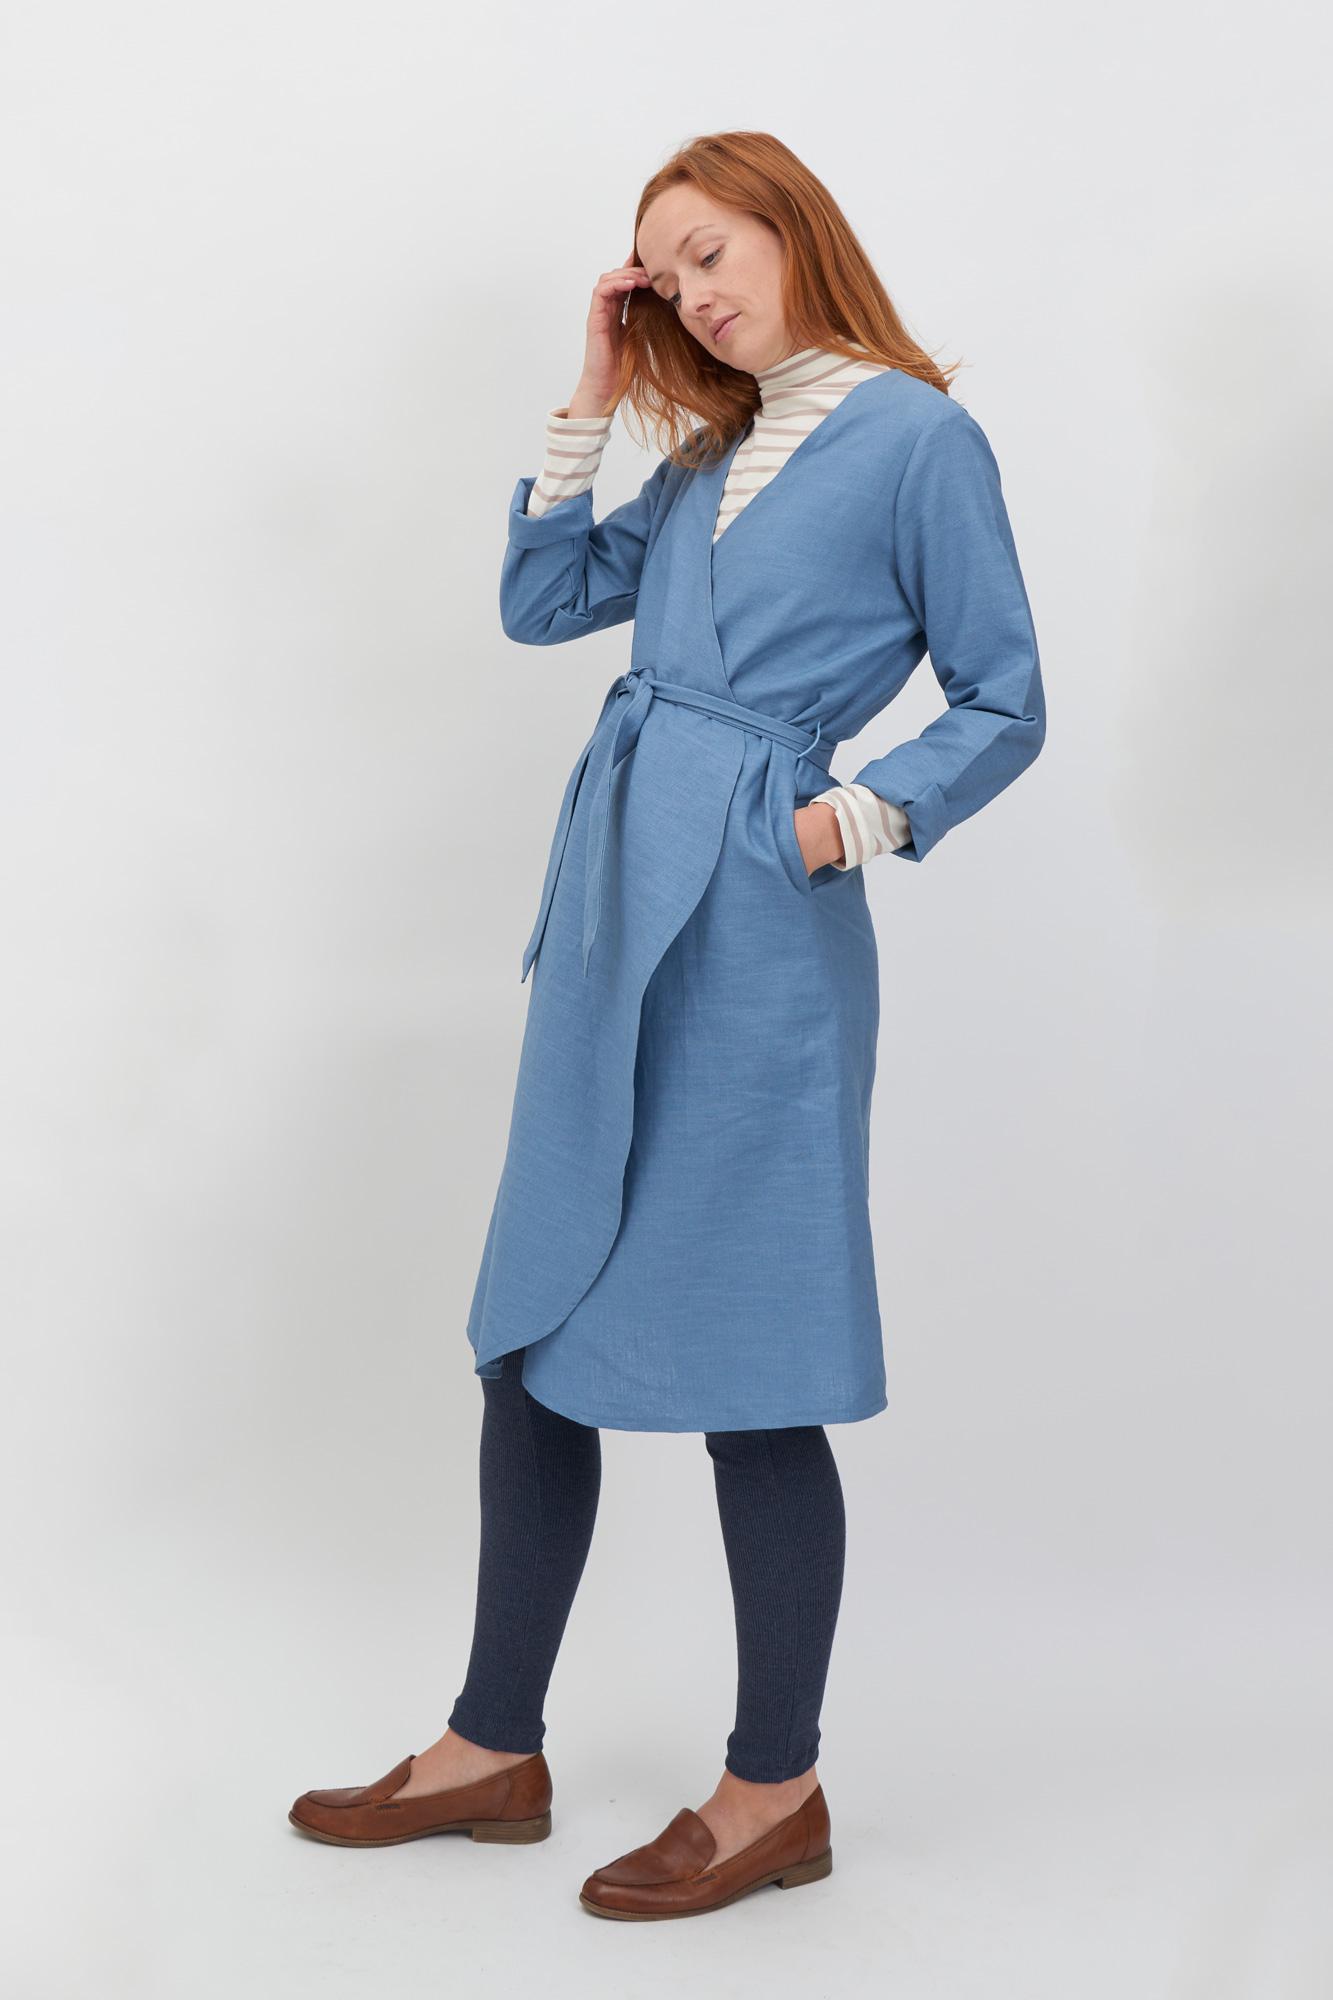 jacket-blue-closed.jpg